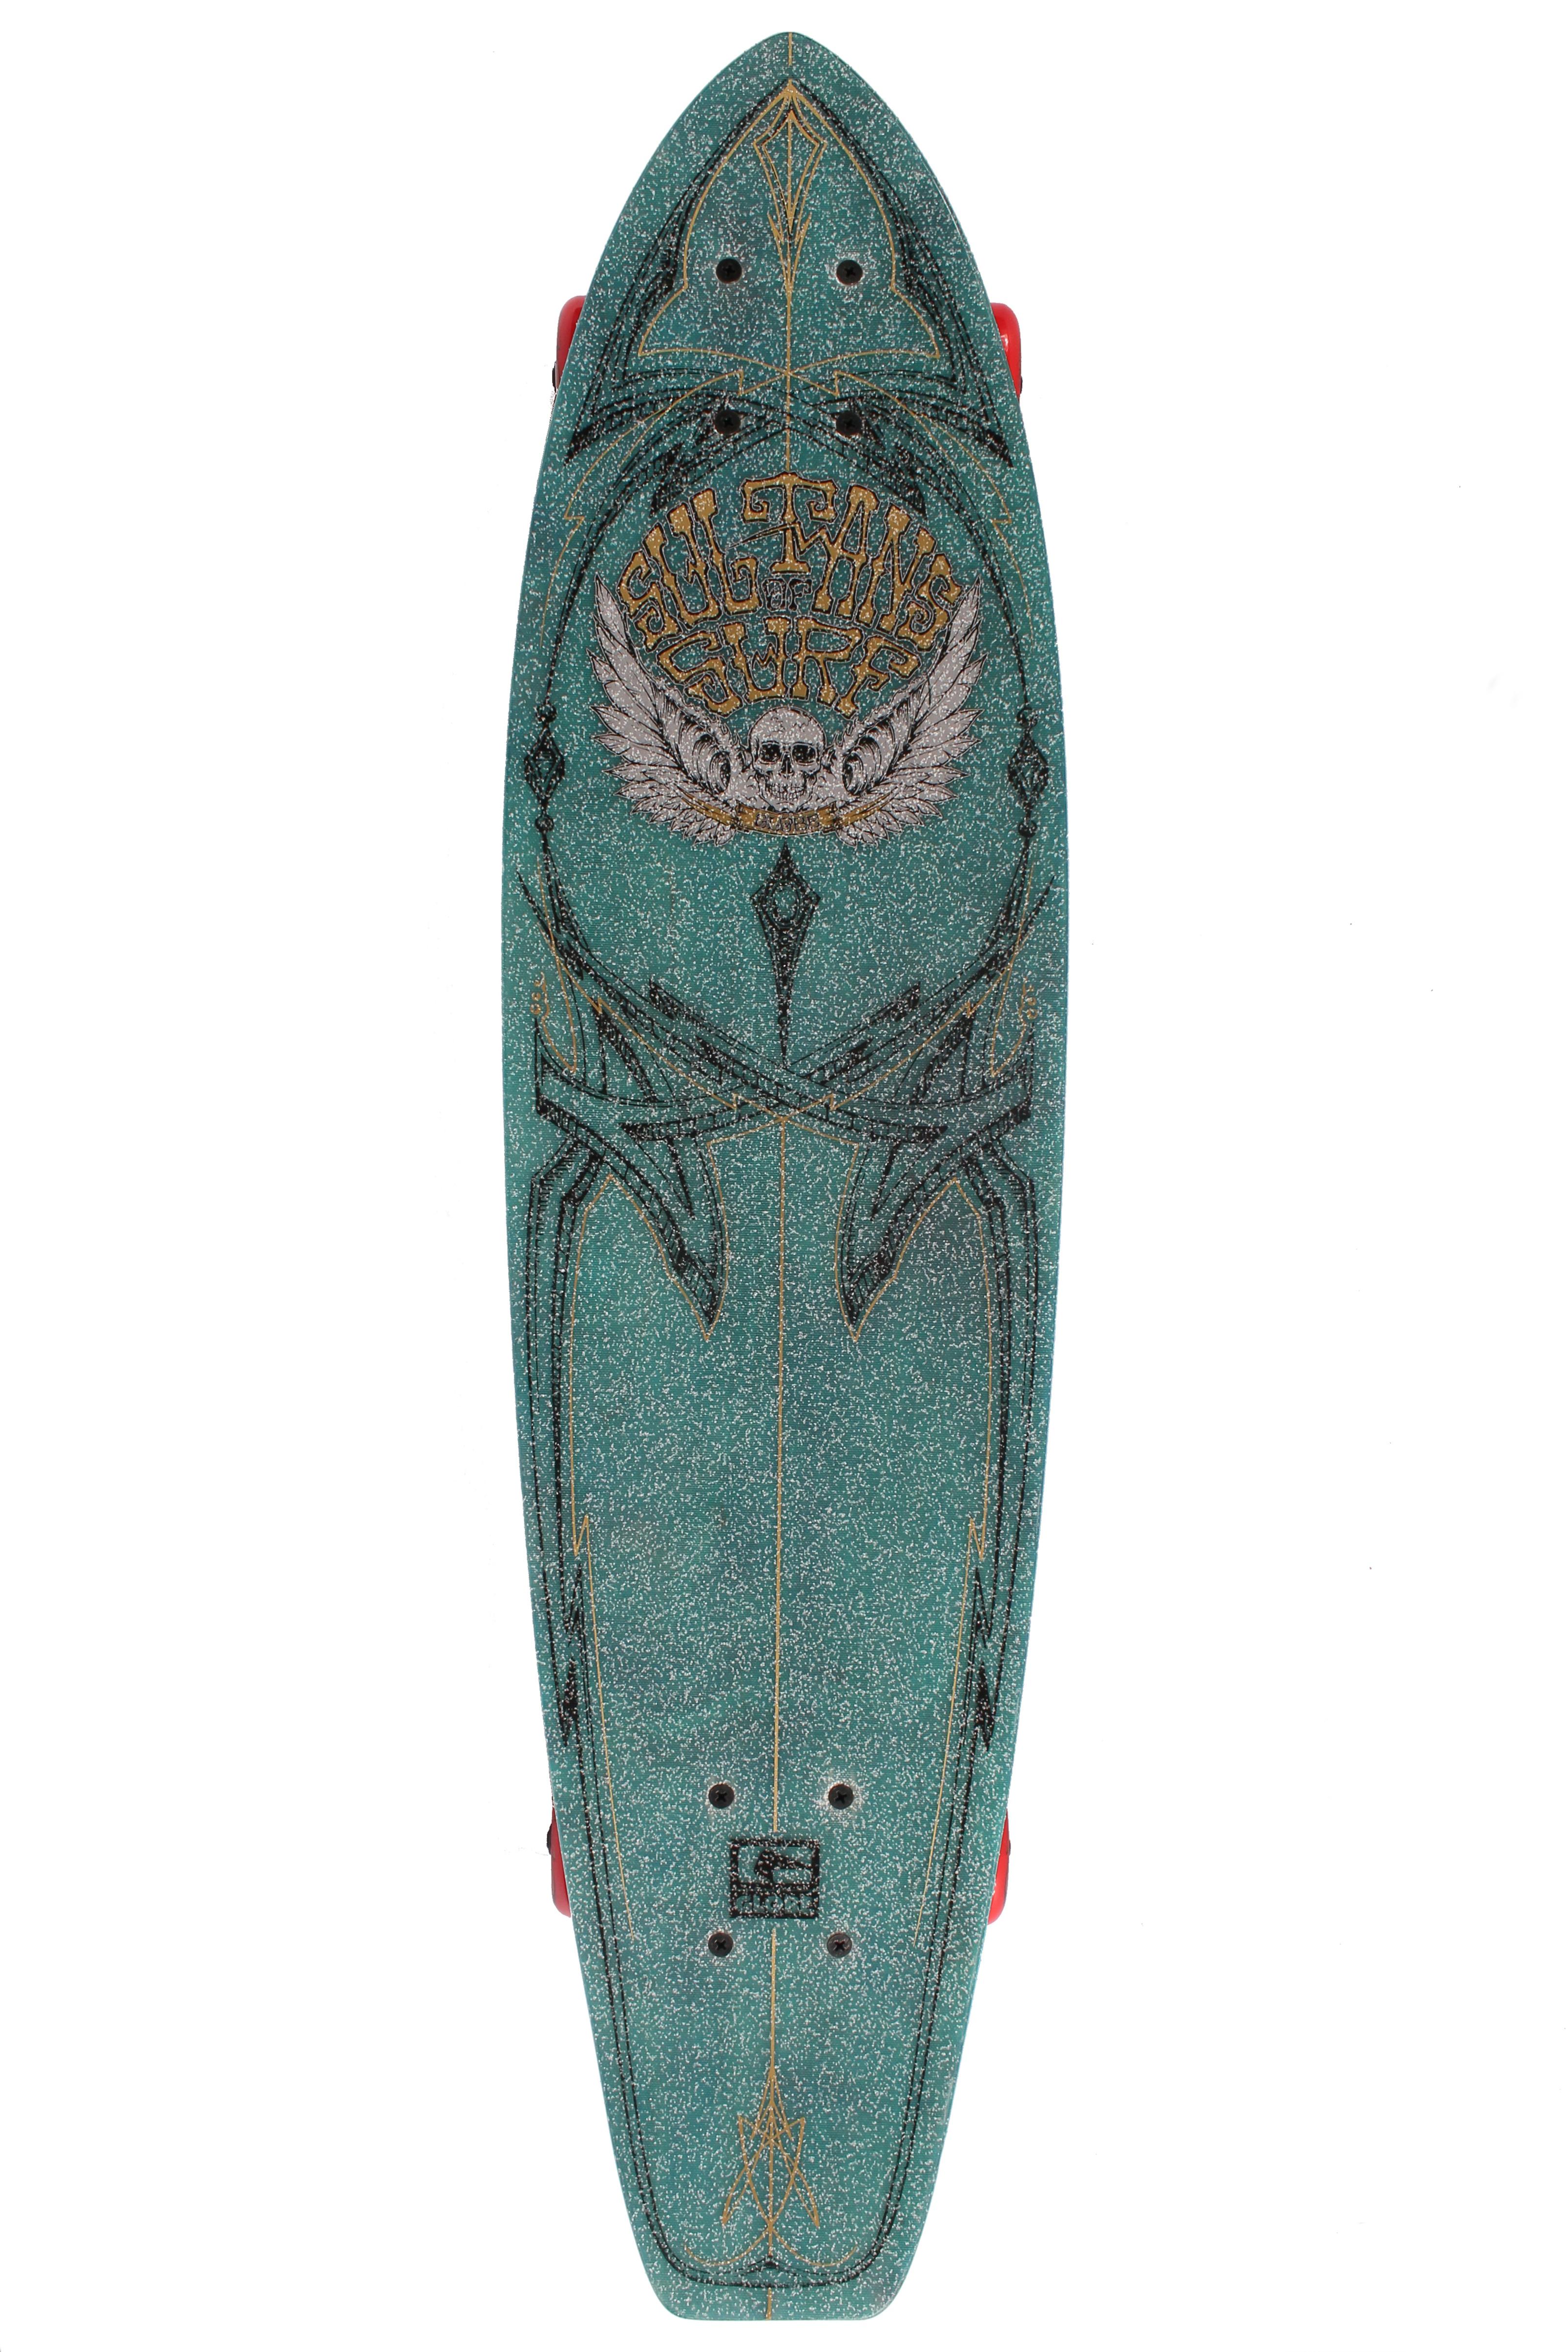 Shortboard Cruiser Globe Sultans Of Surf Pottz 31